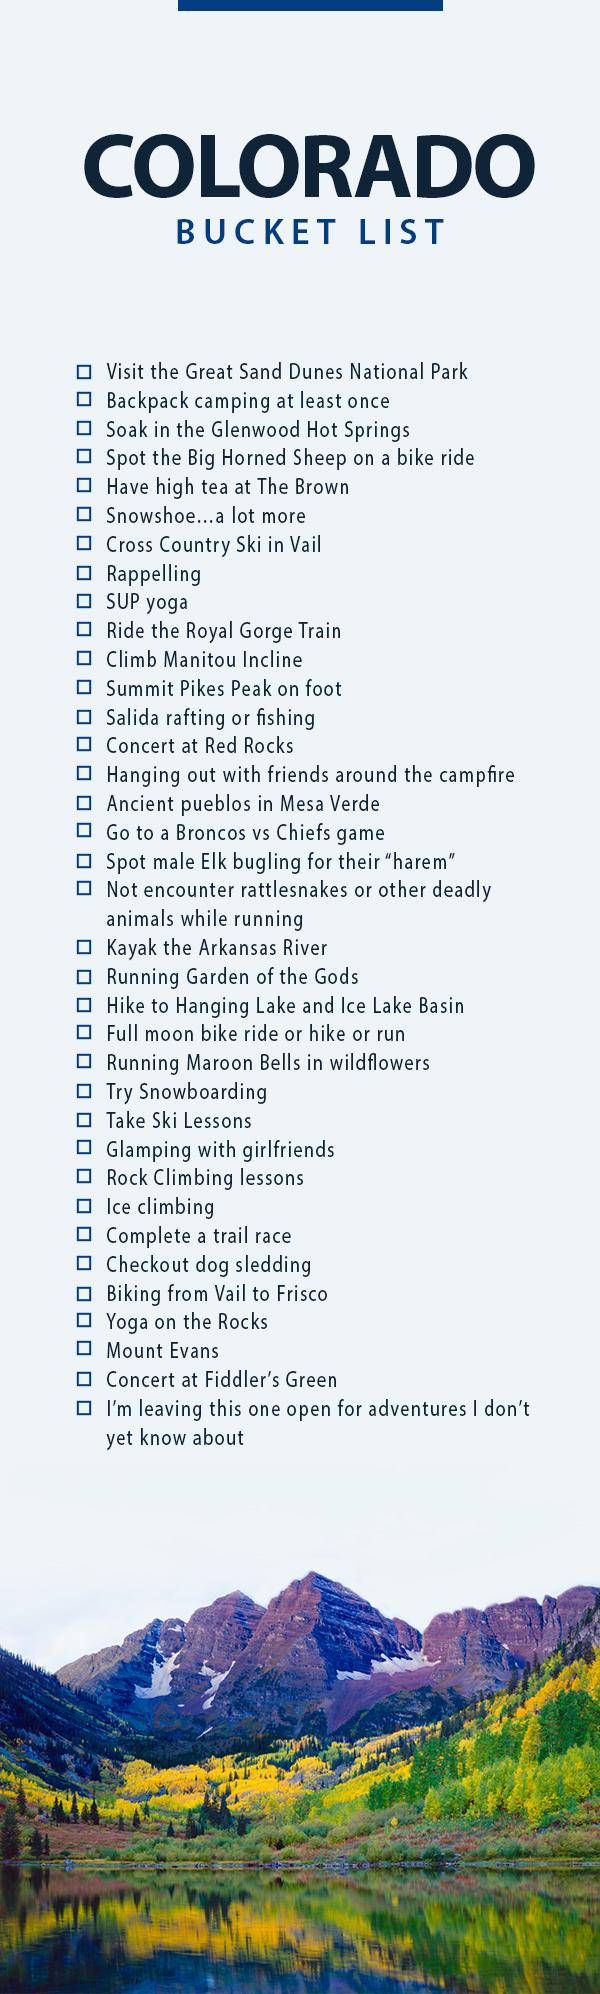 Colorado Bucket List: Must Do and See - A bucket list of adventurous ideas